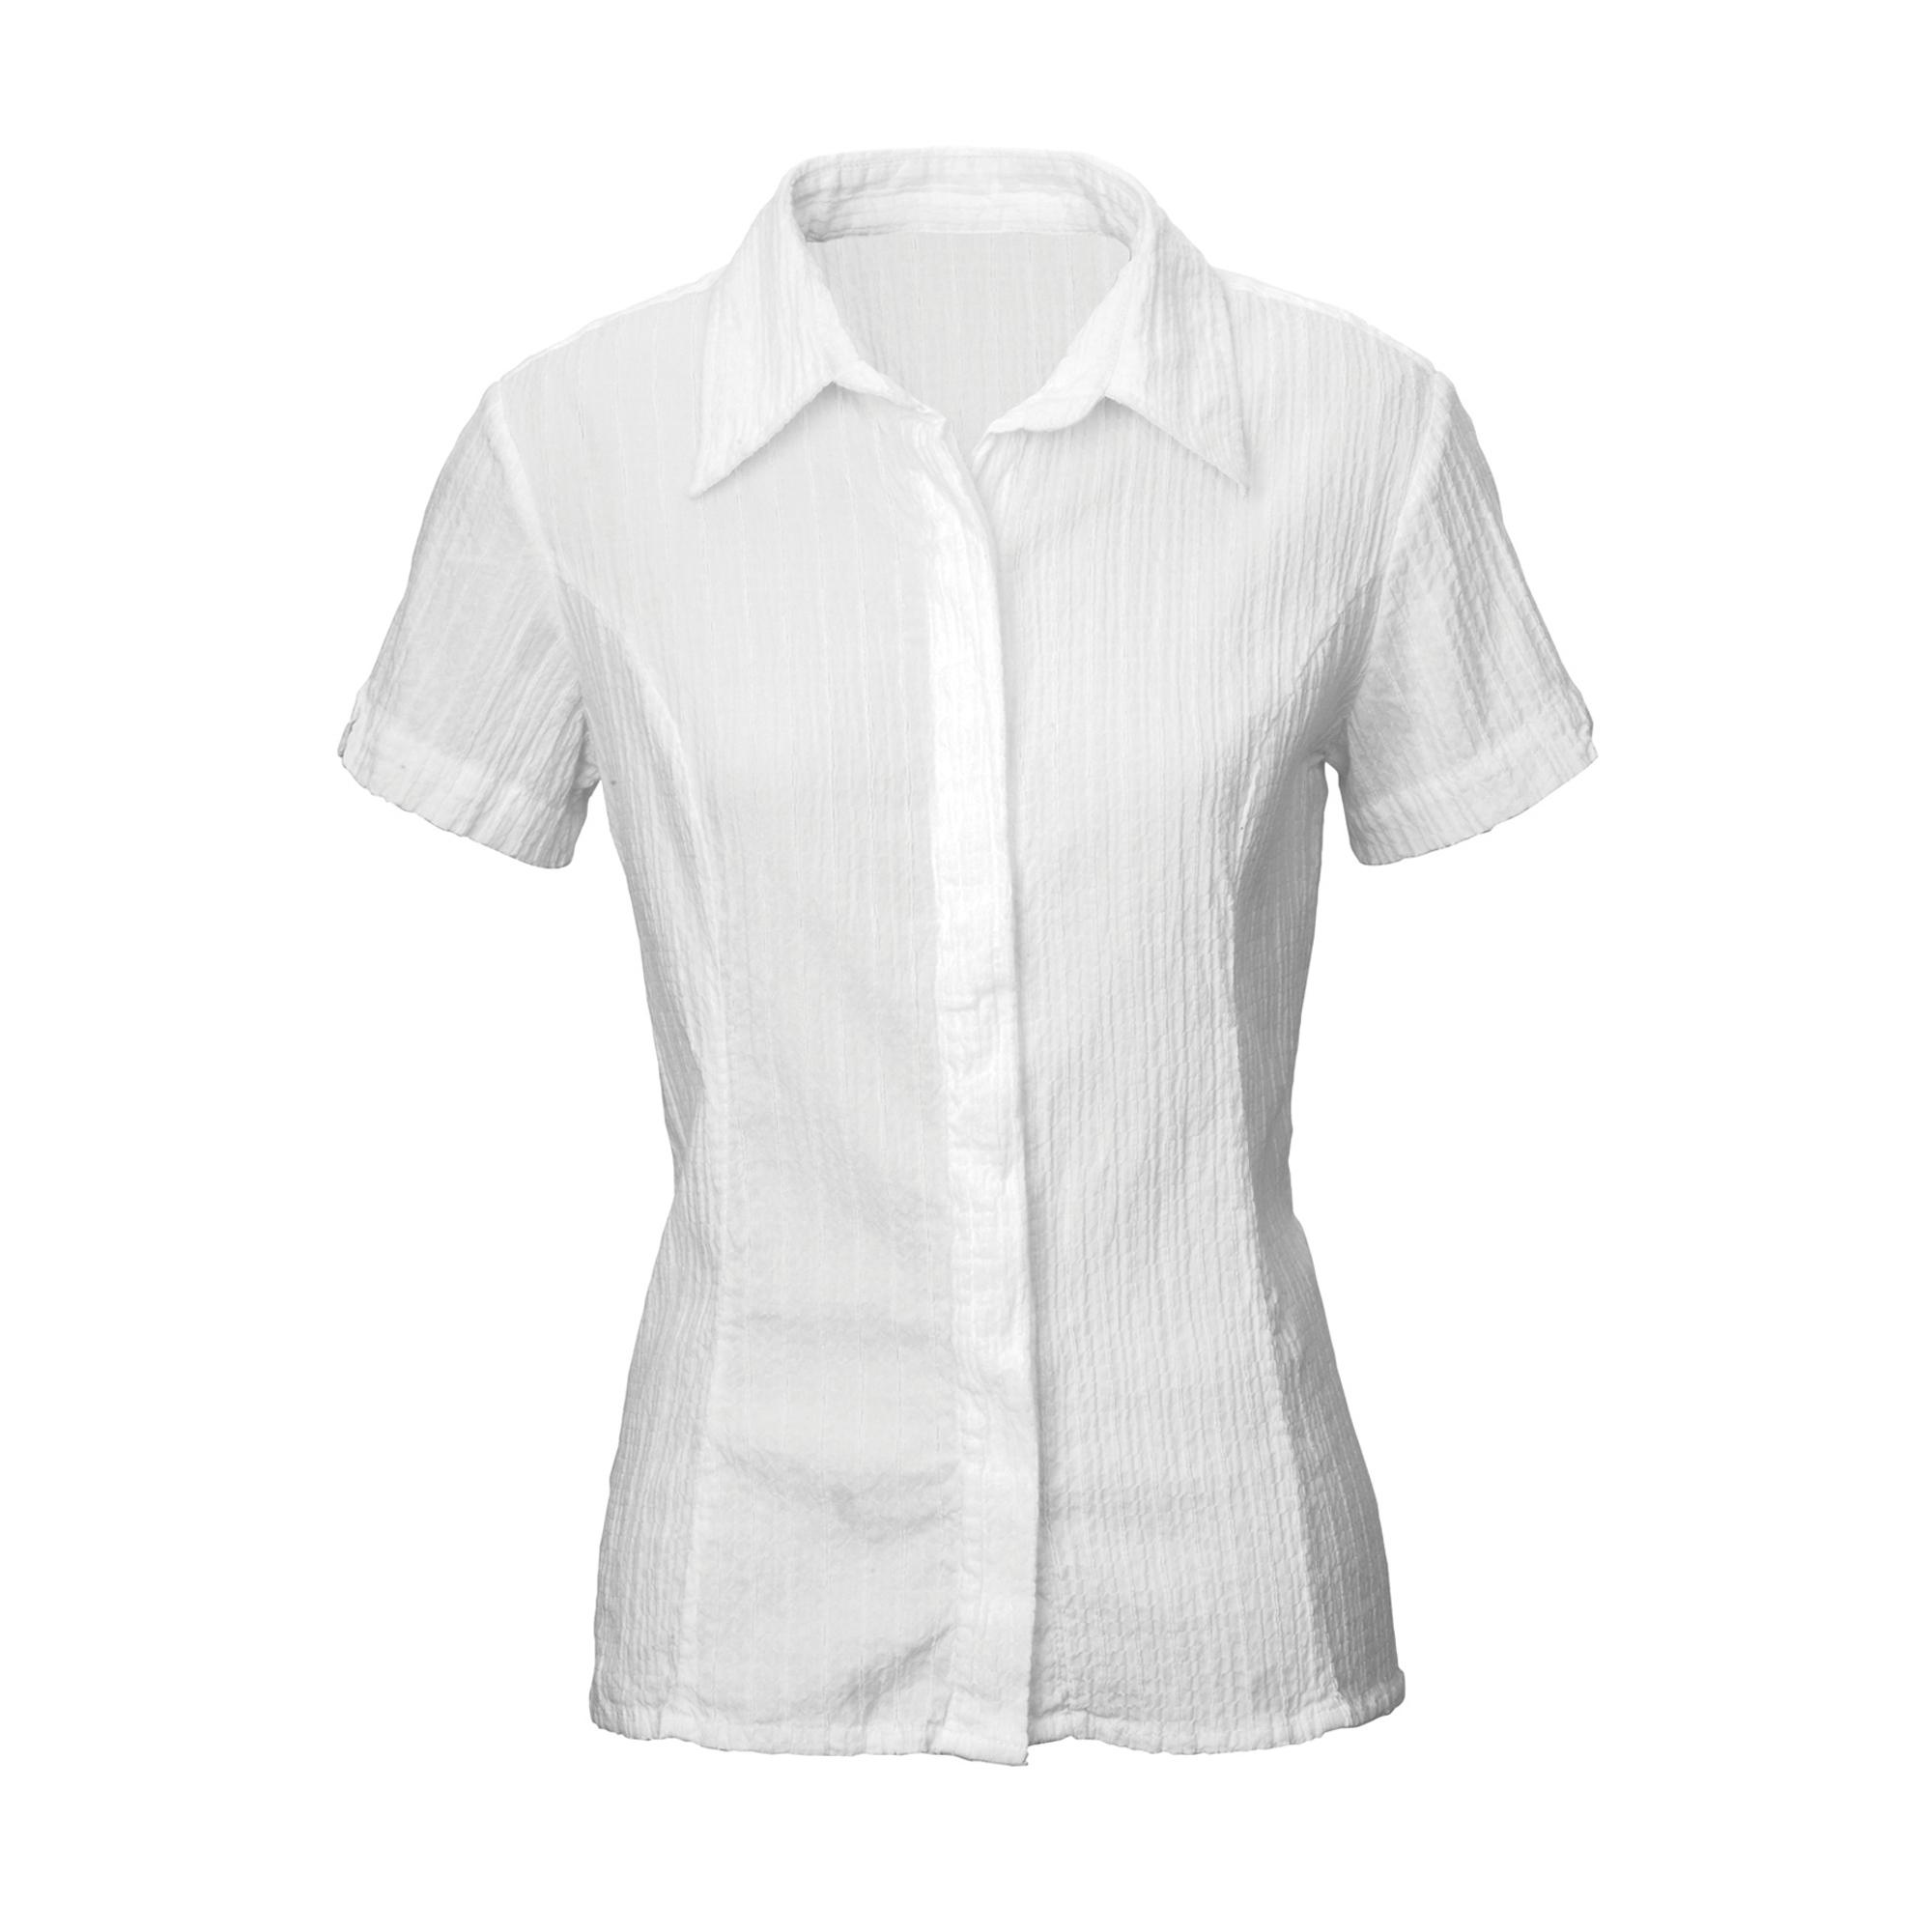 T shirt white woman - Clearance